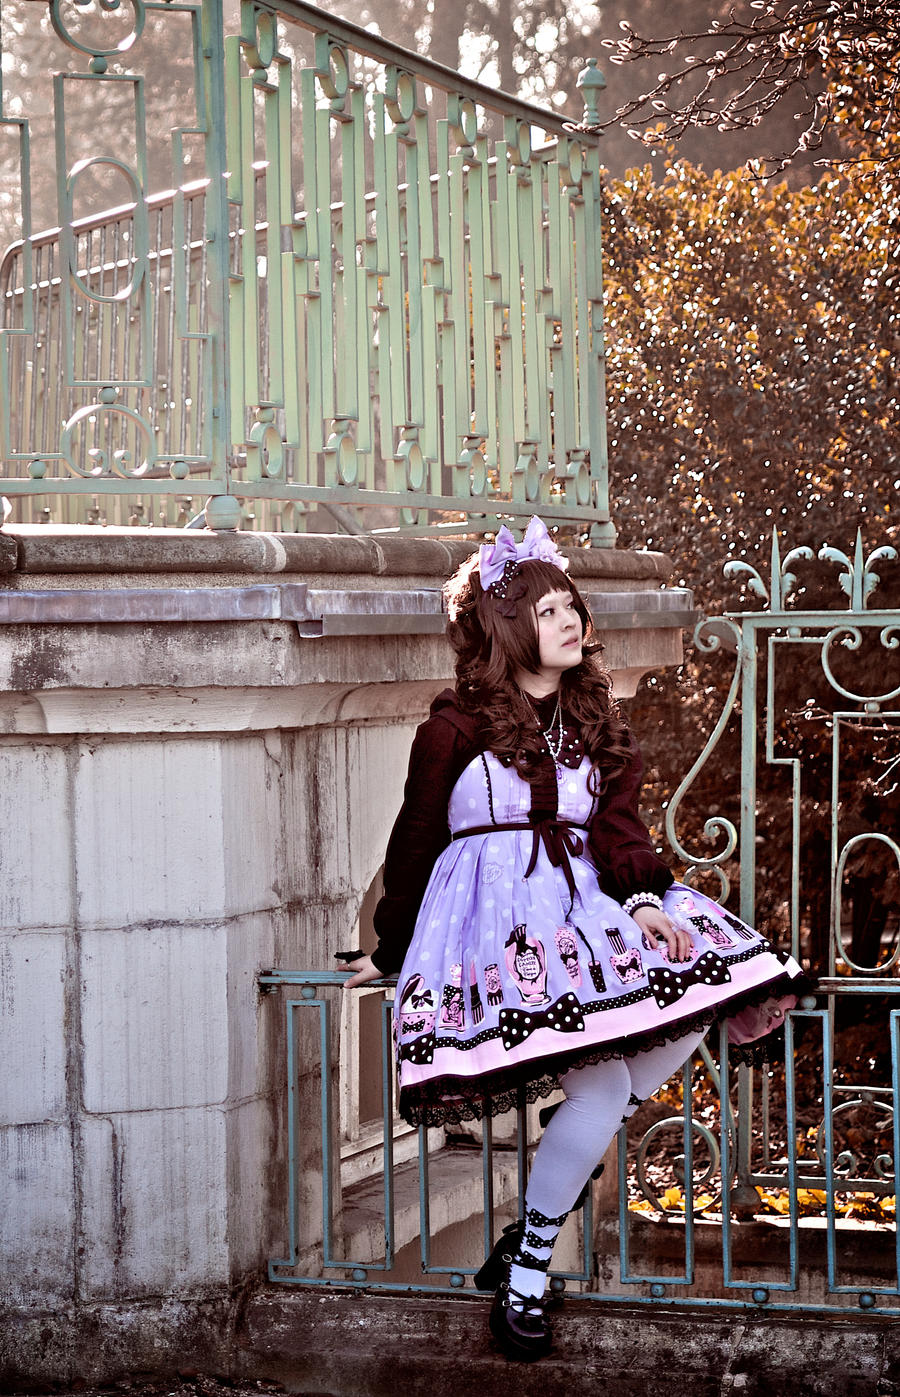 Spring perfume by Revelio